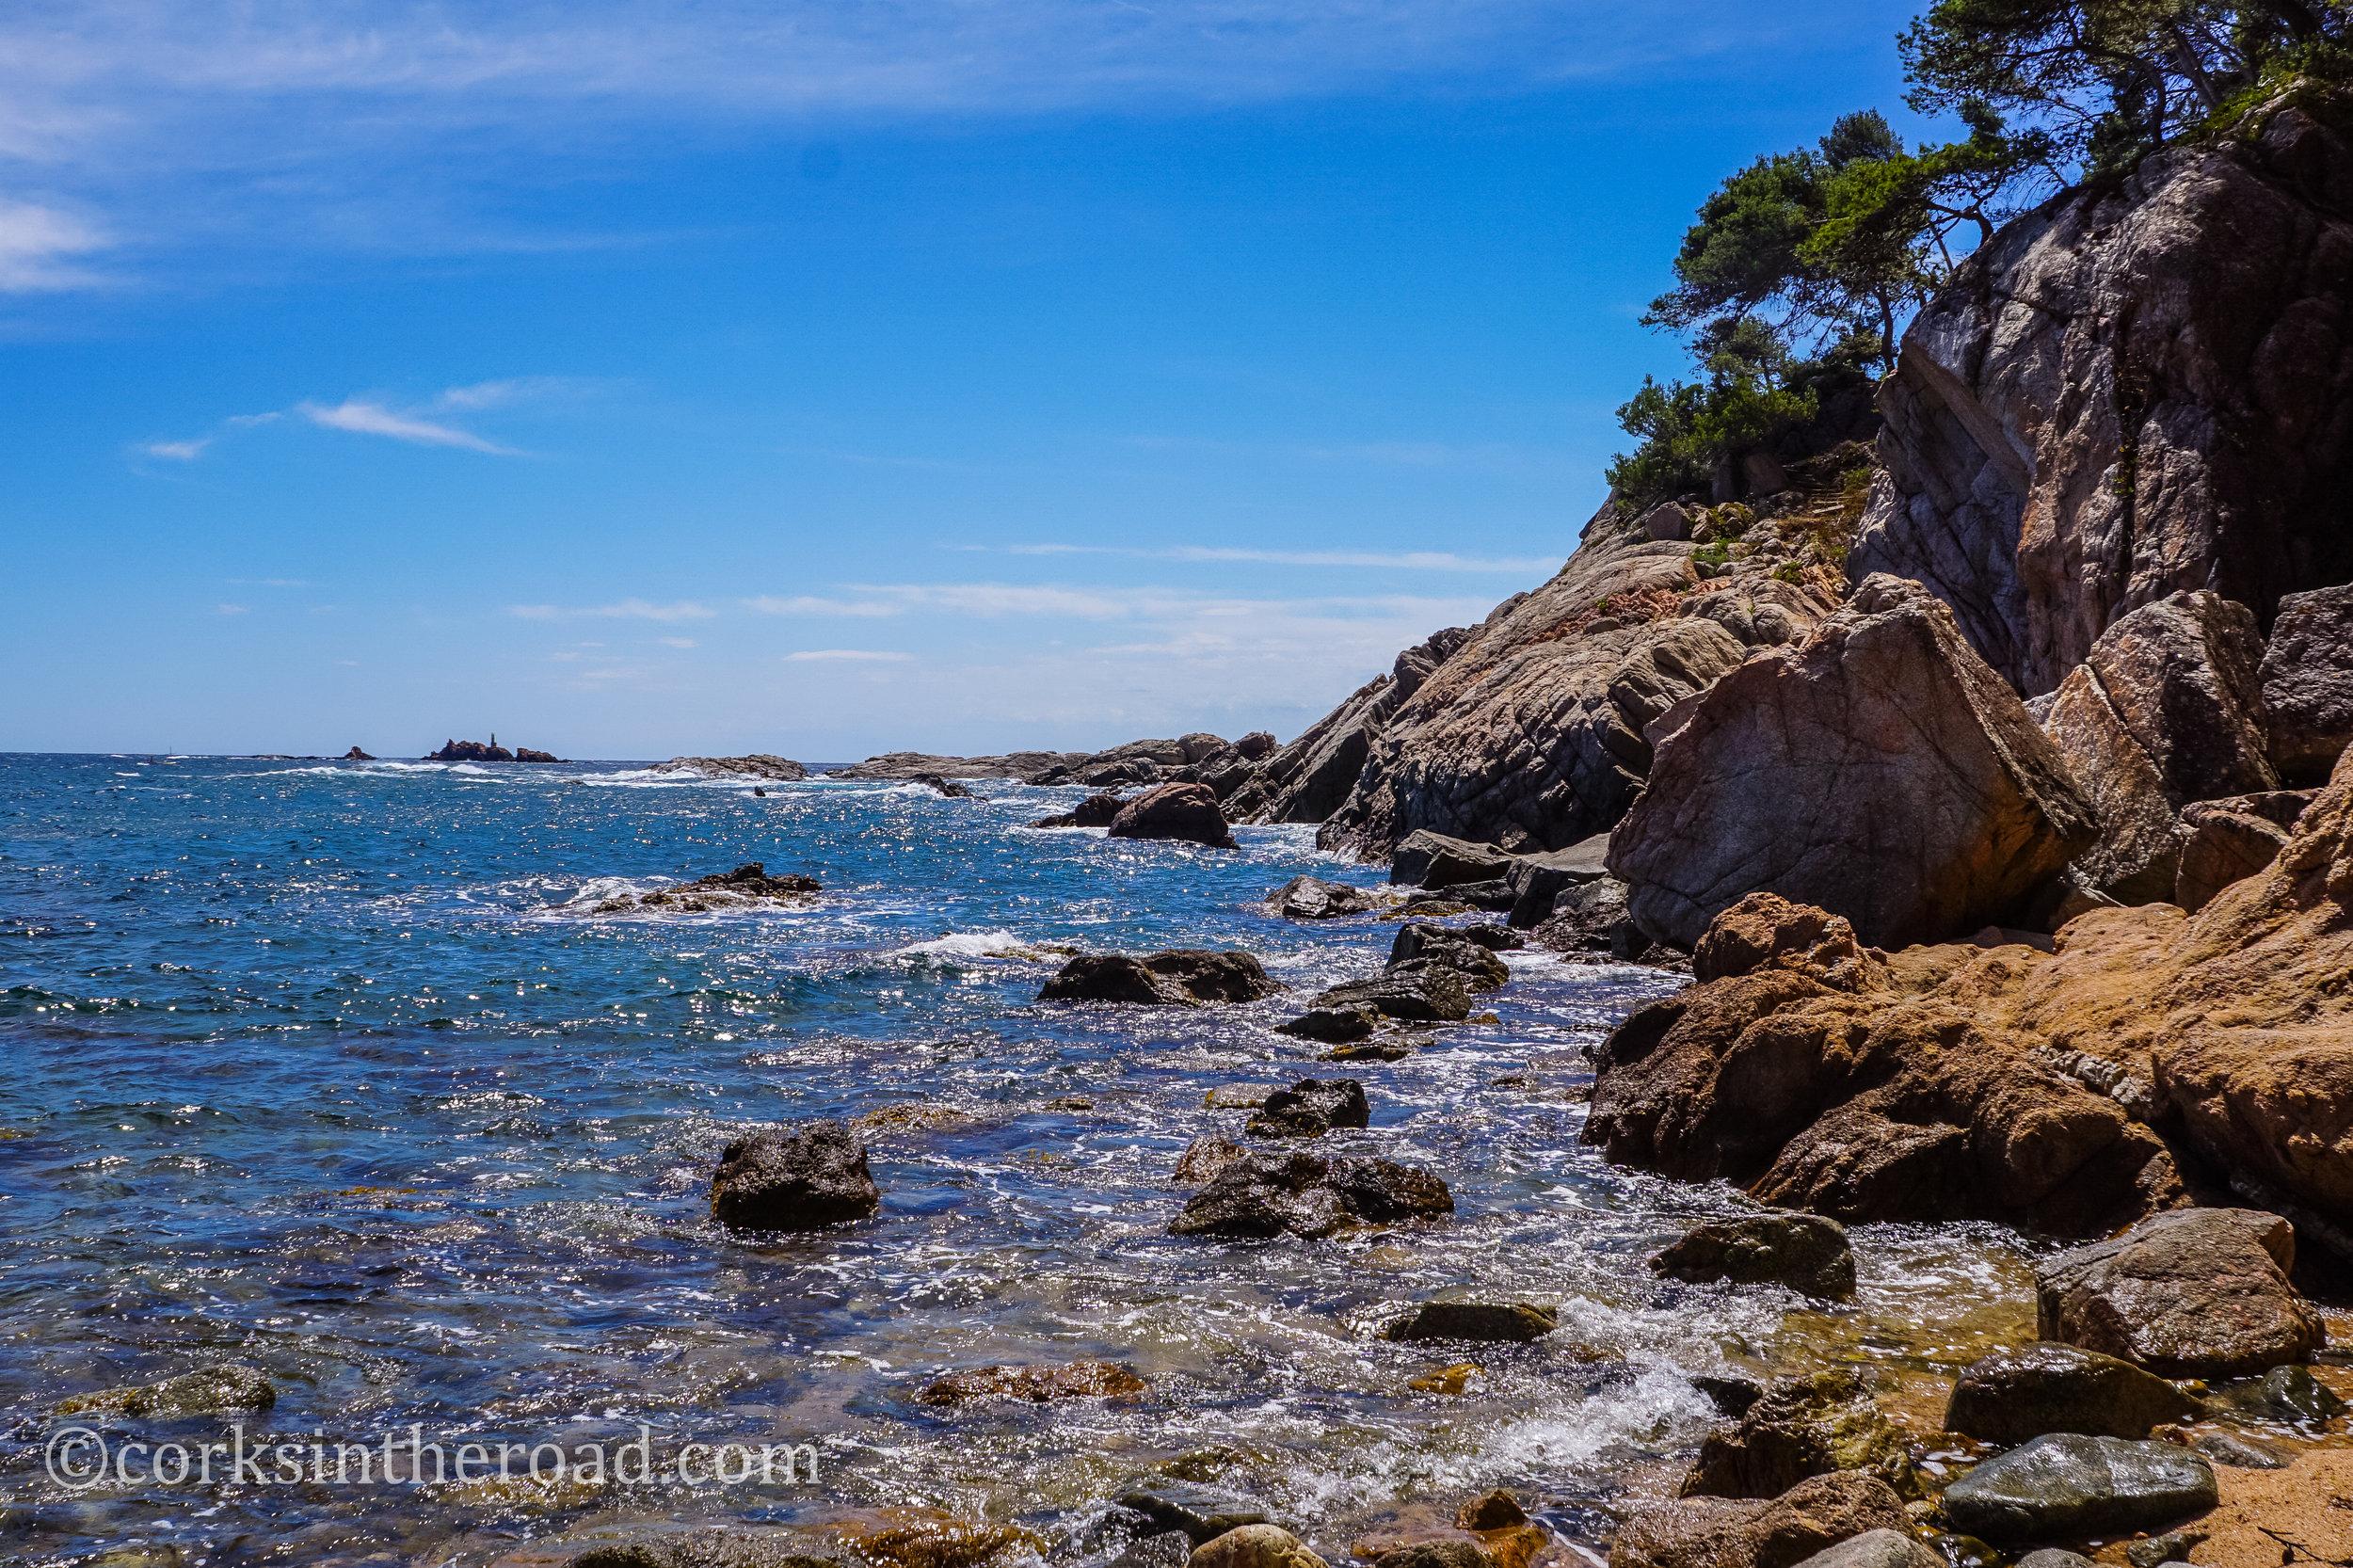 20160810Barcelona, Corksintheroad, Costa Brava, Costa Brava Landscape-35.jpg